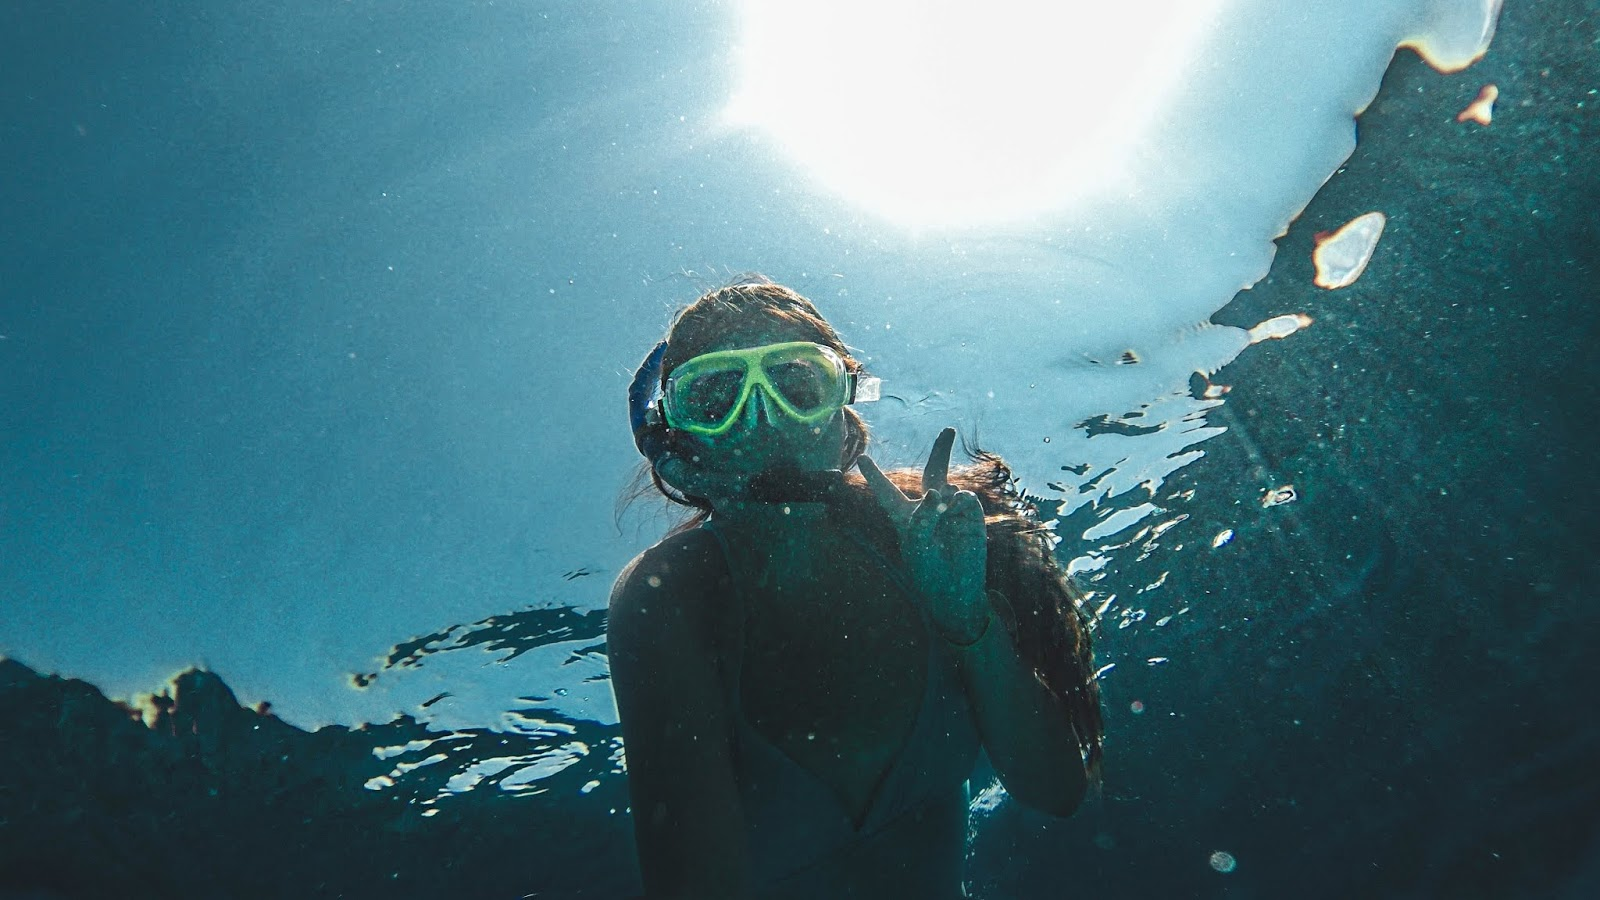 Go Pro Photos, GoPro Underwater Photos, GoPro Camera Review